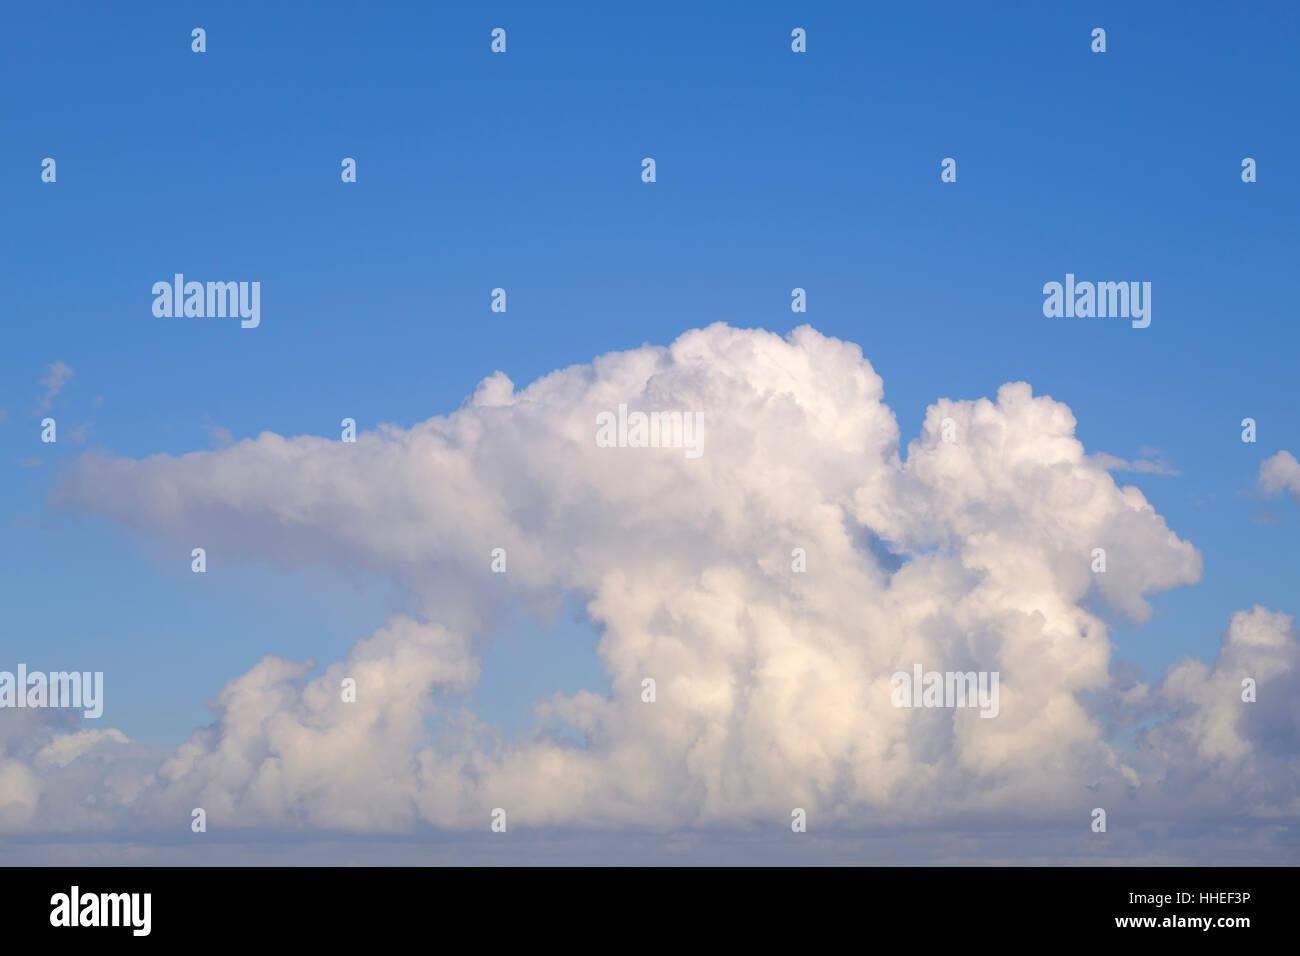 Cumulonimbus clouds, Tenerife, Spain - Stock Image